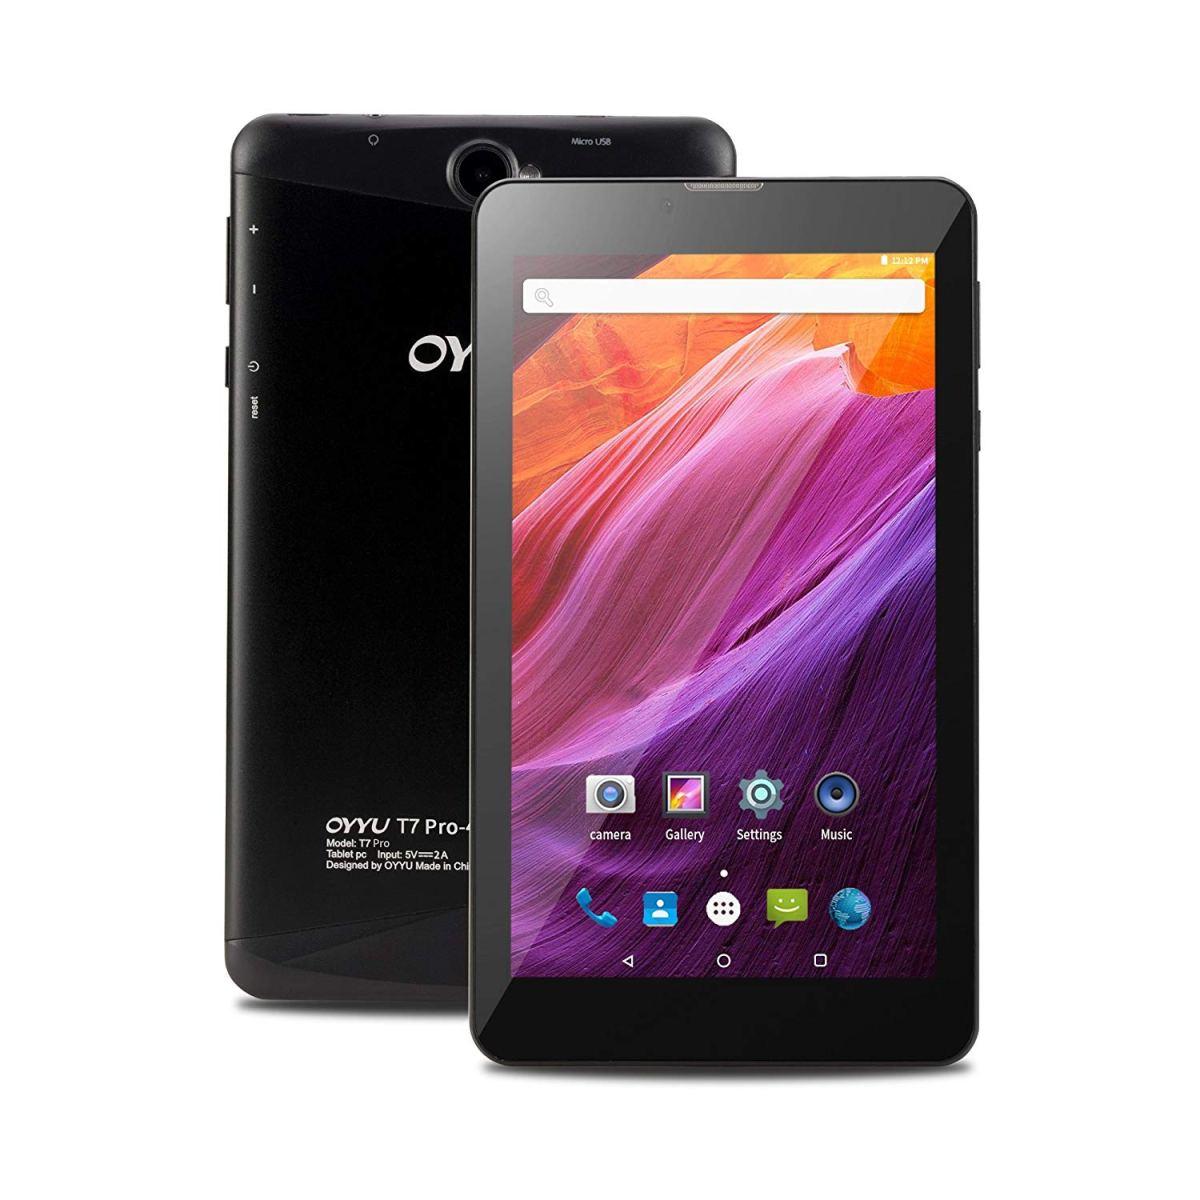 2018 OYYU T7 Pro 7 Inch 4G LTE Phablet